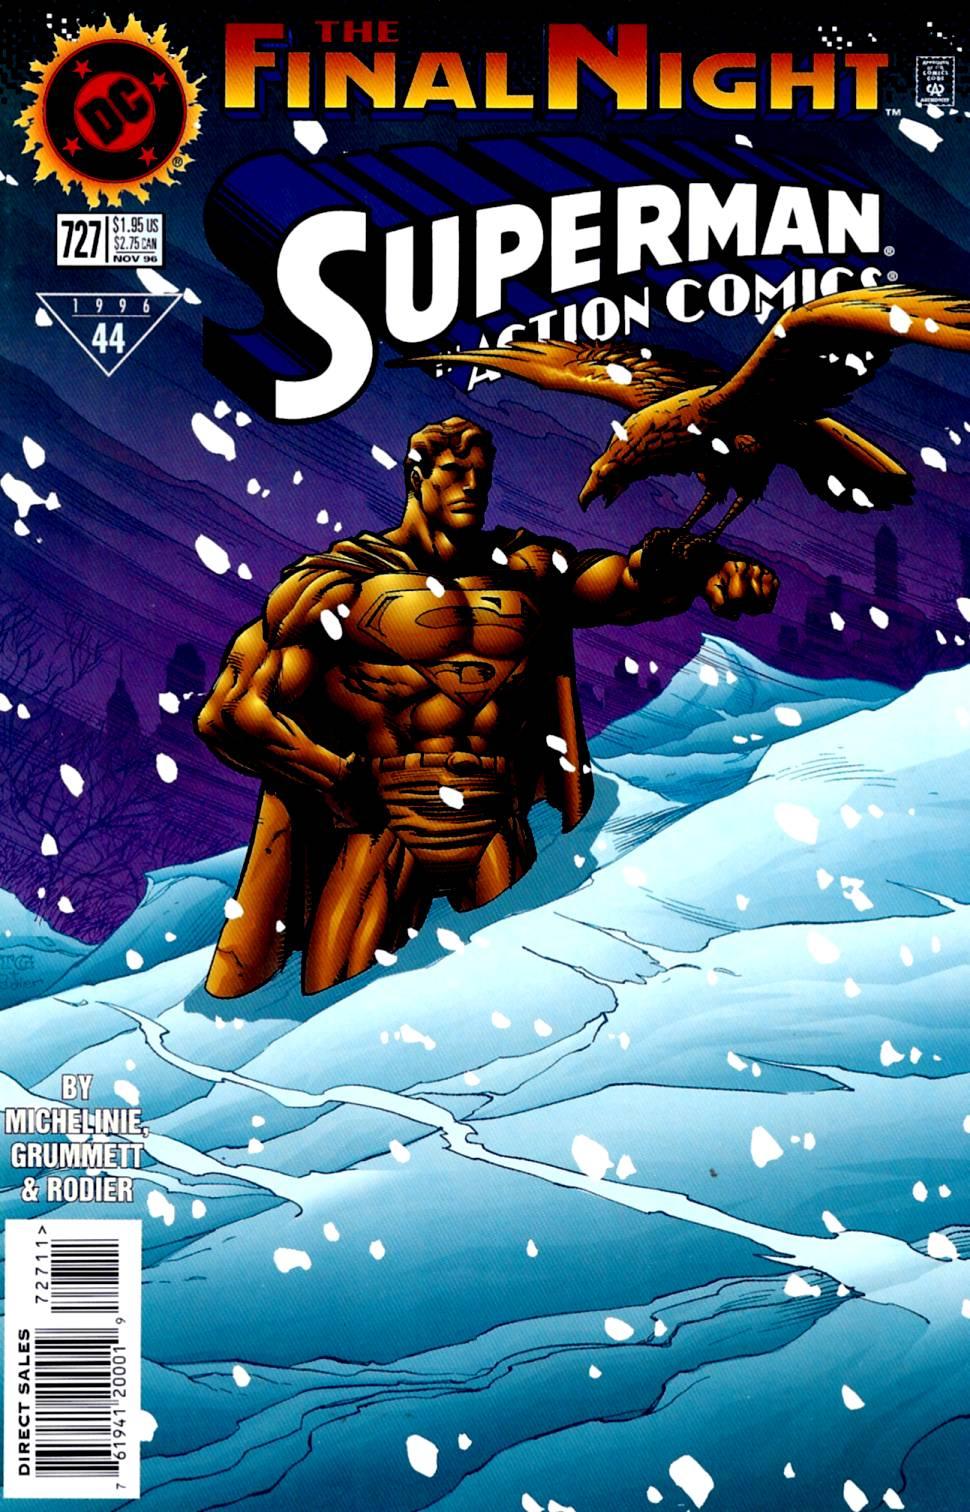 Action Comics (1938) 727 Page 1